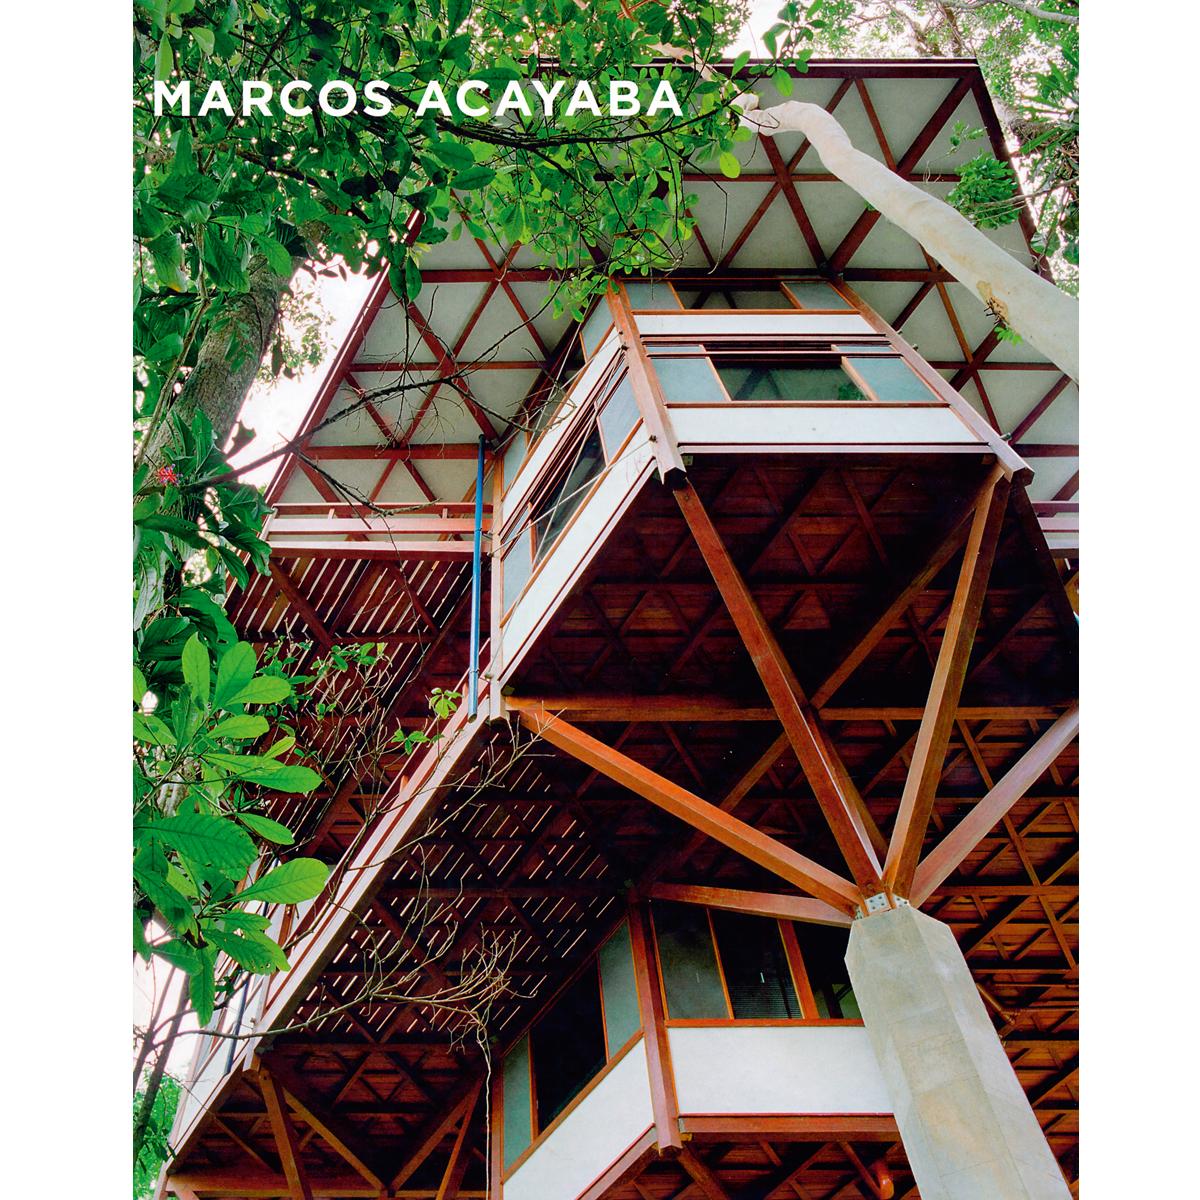 Marcos Acayaba